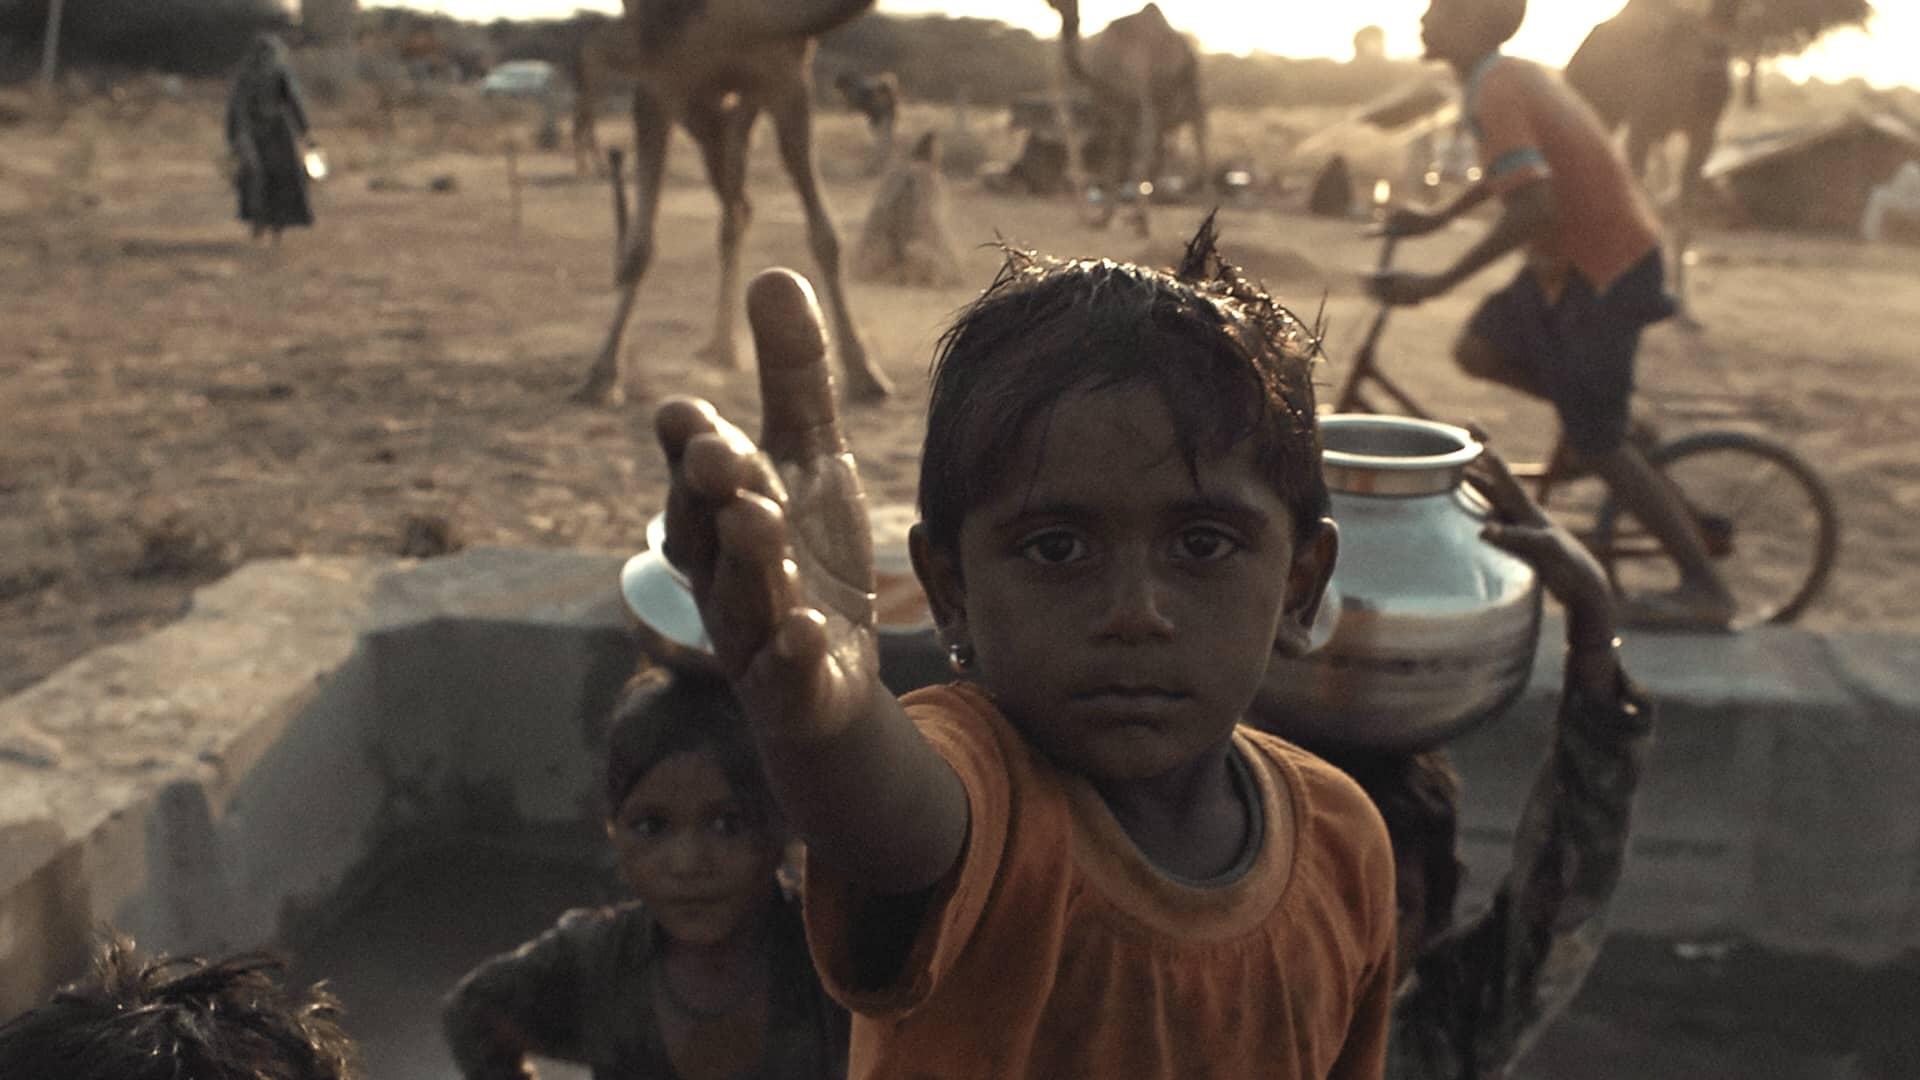 yermo-documental-mexicano-sobre-desiertos